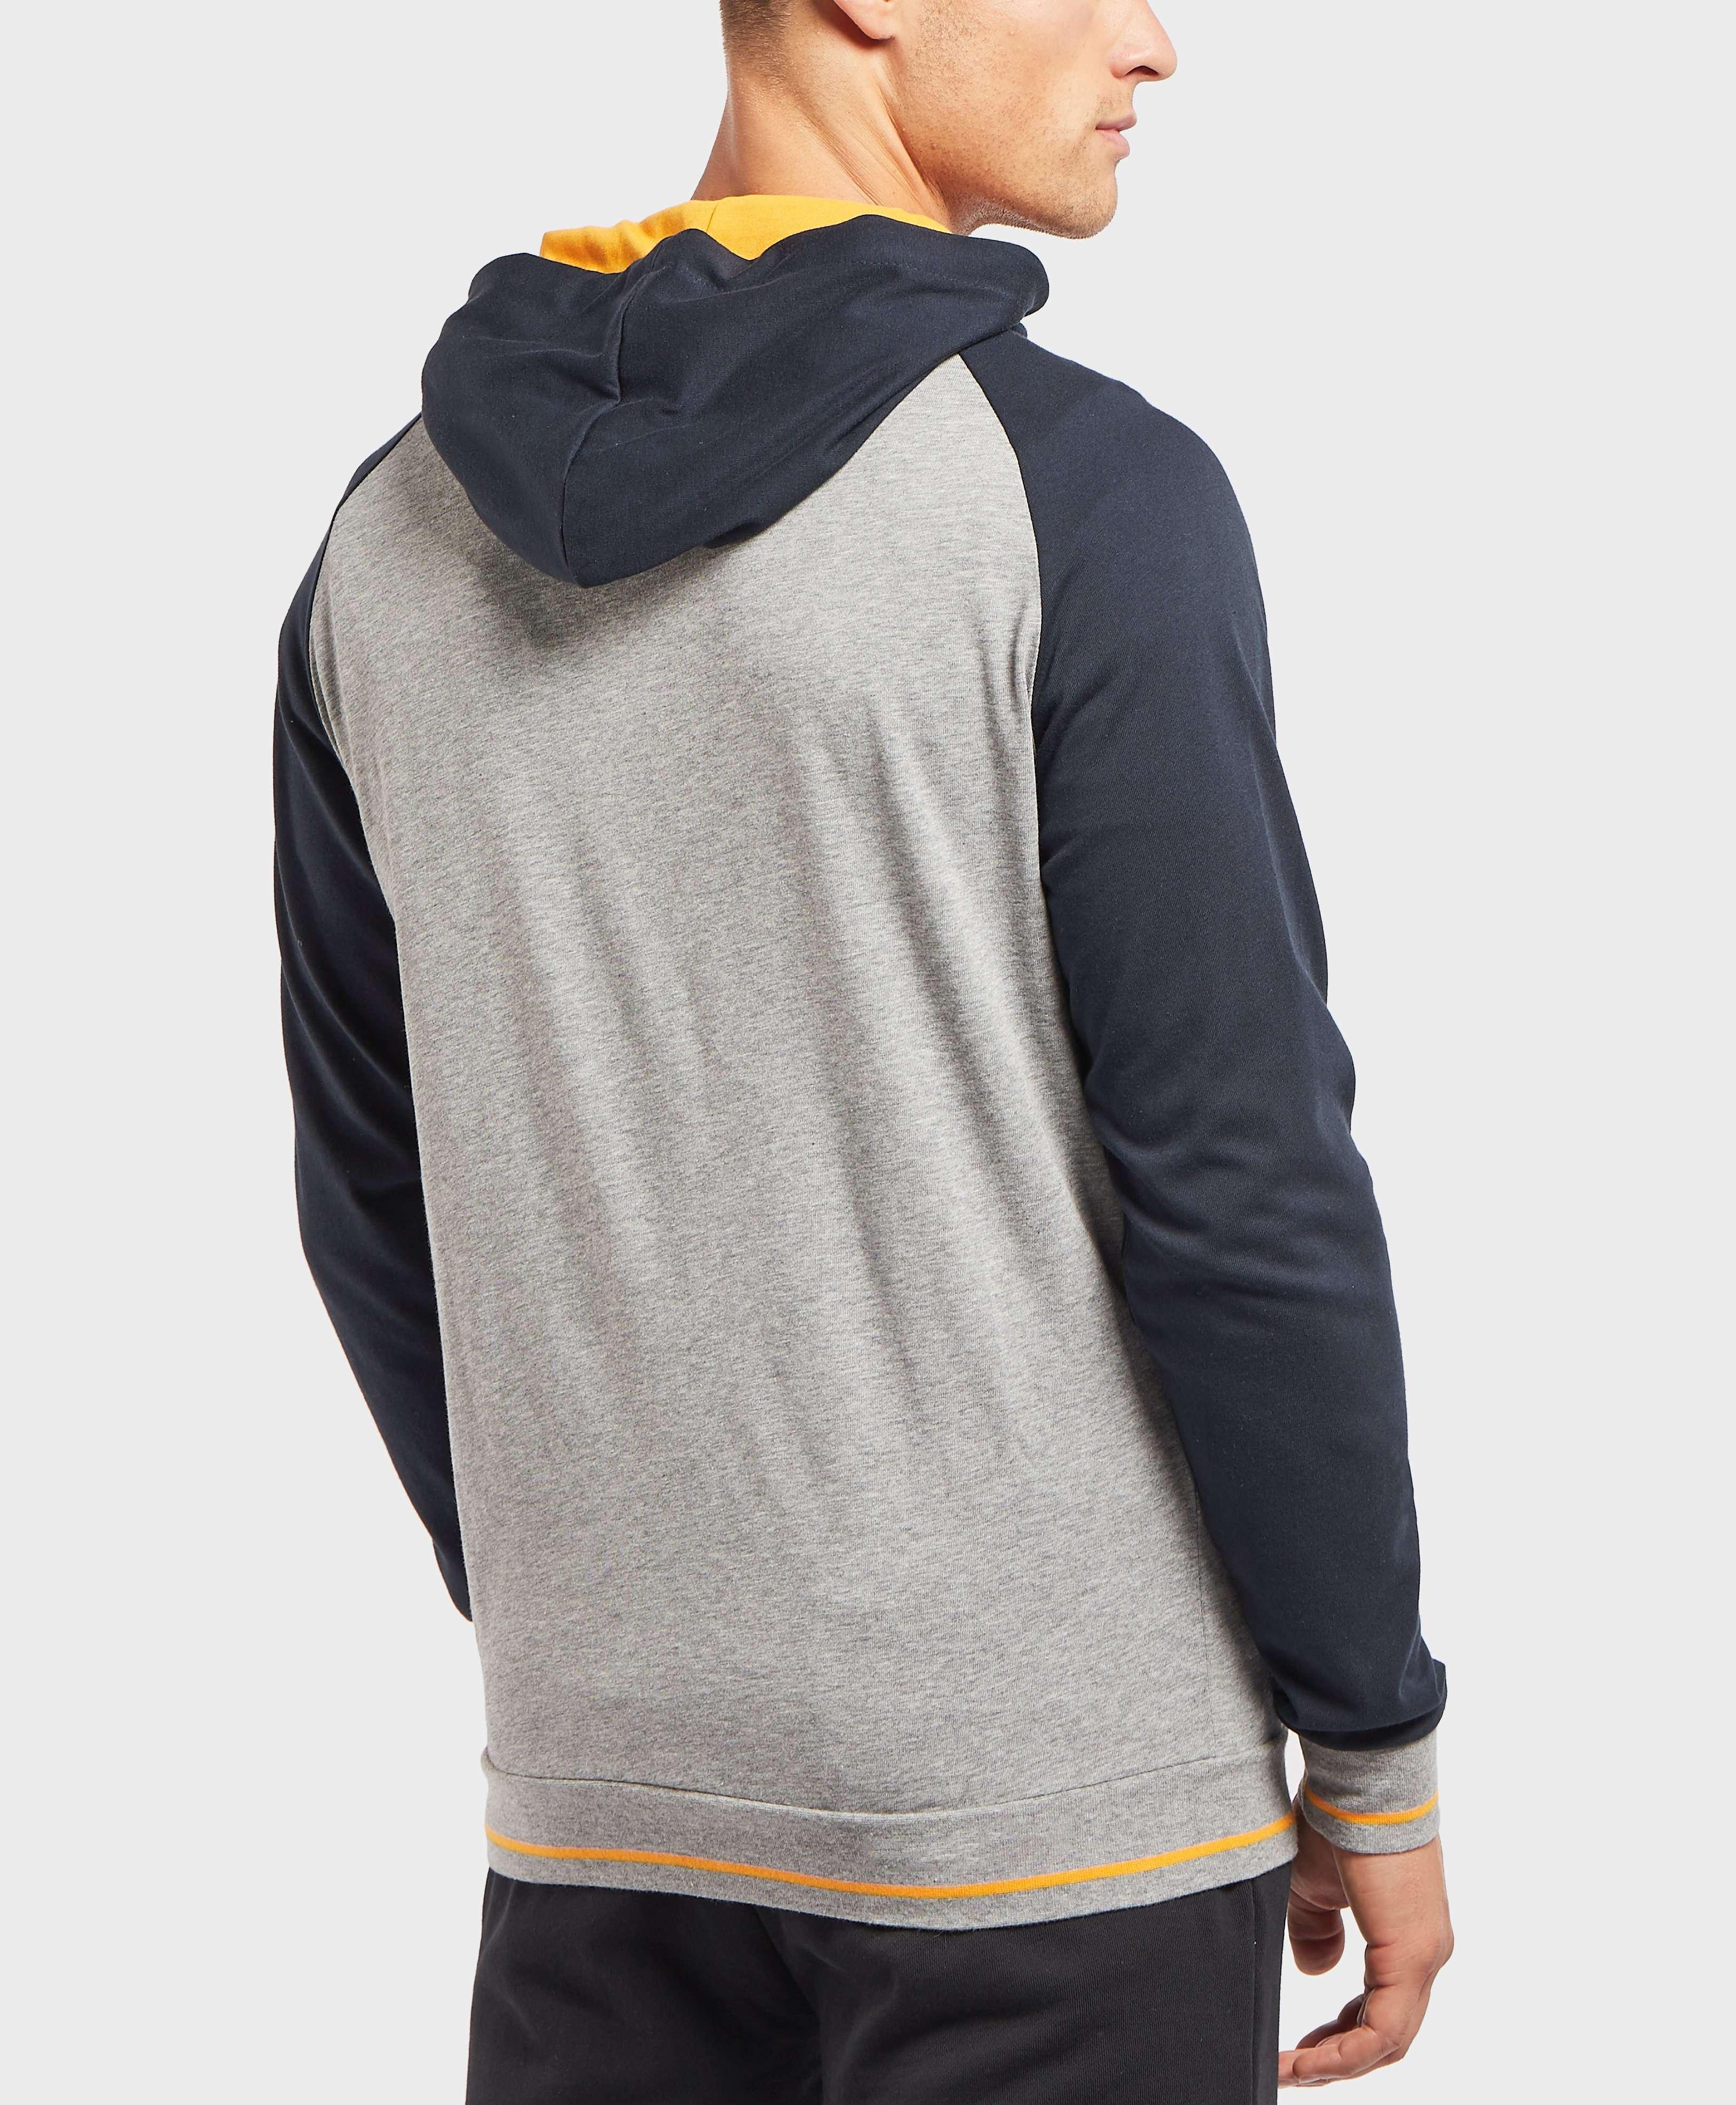 BOSS Authentic Full Zip Hoodie